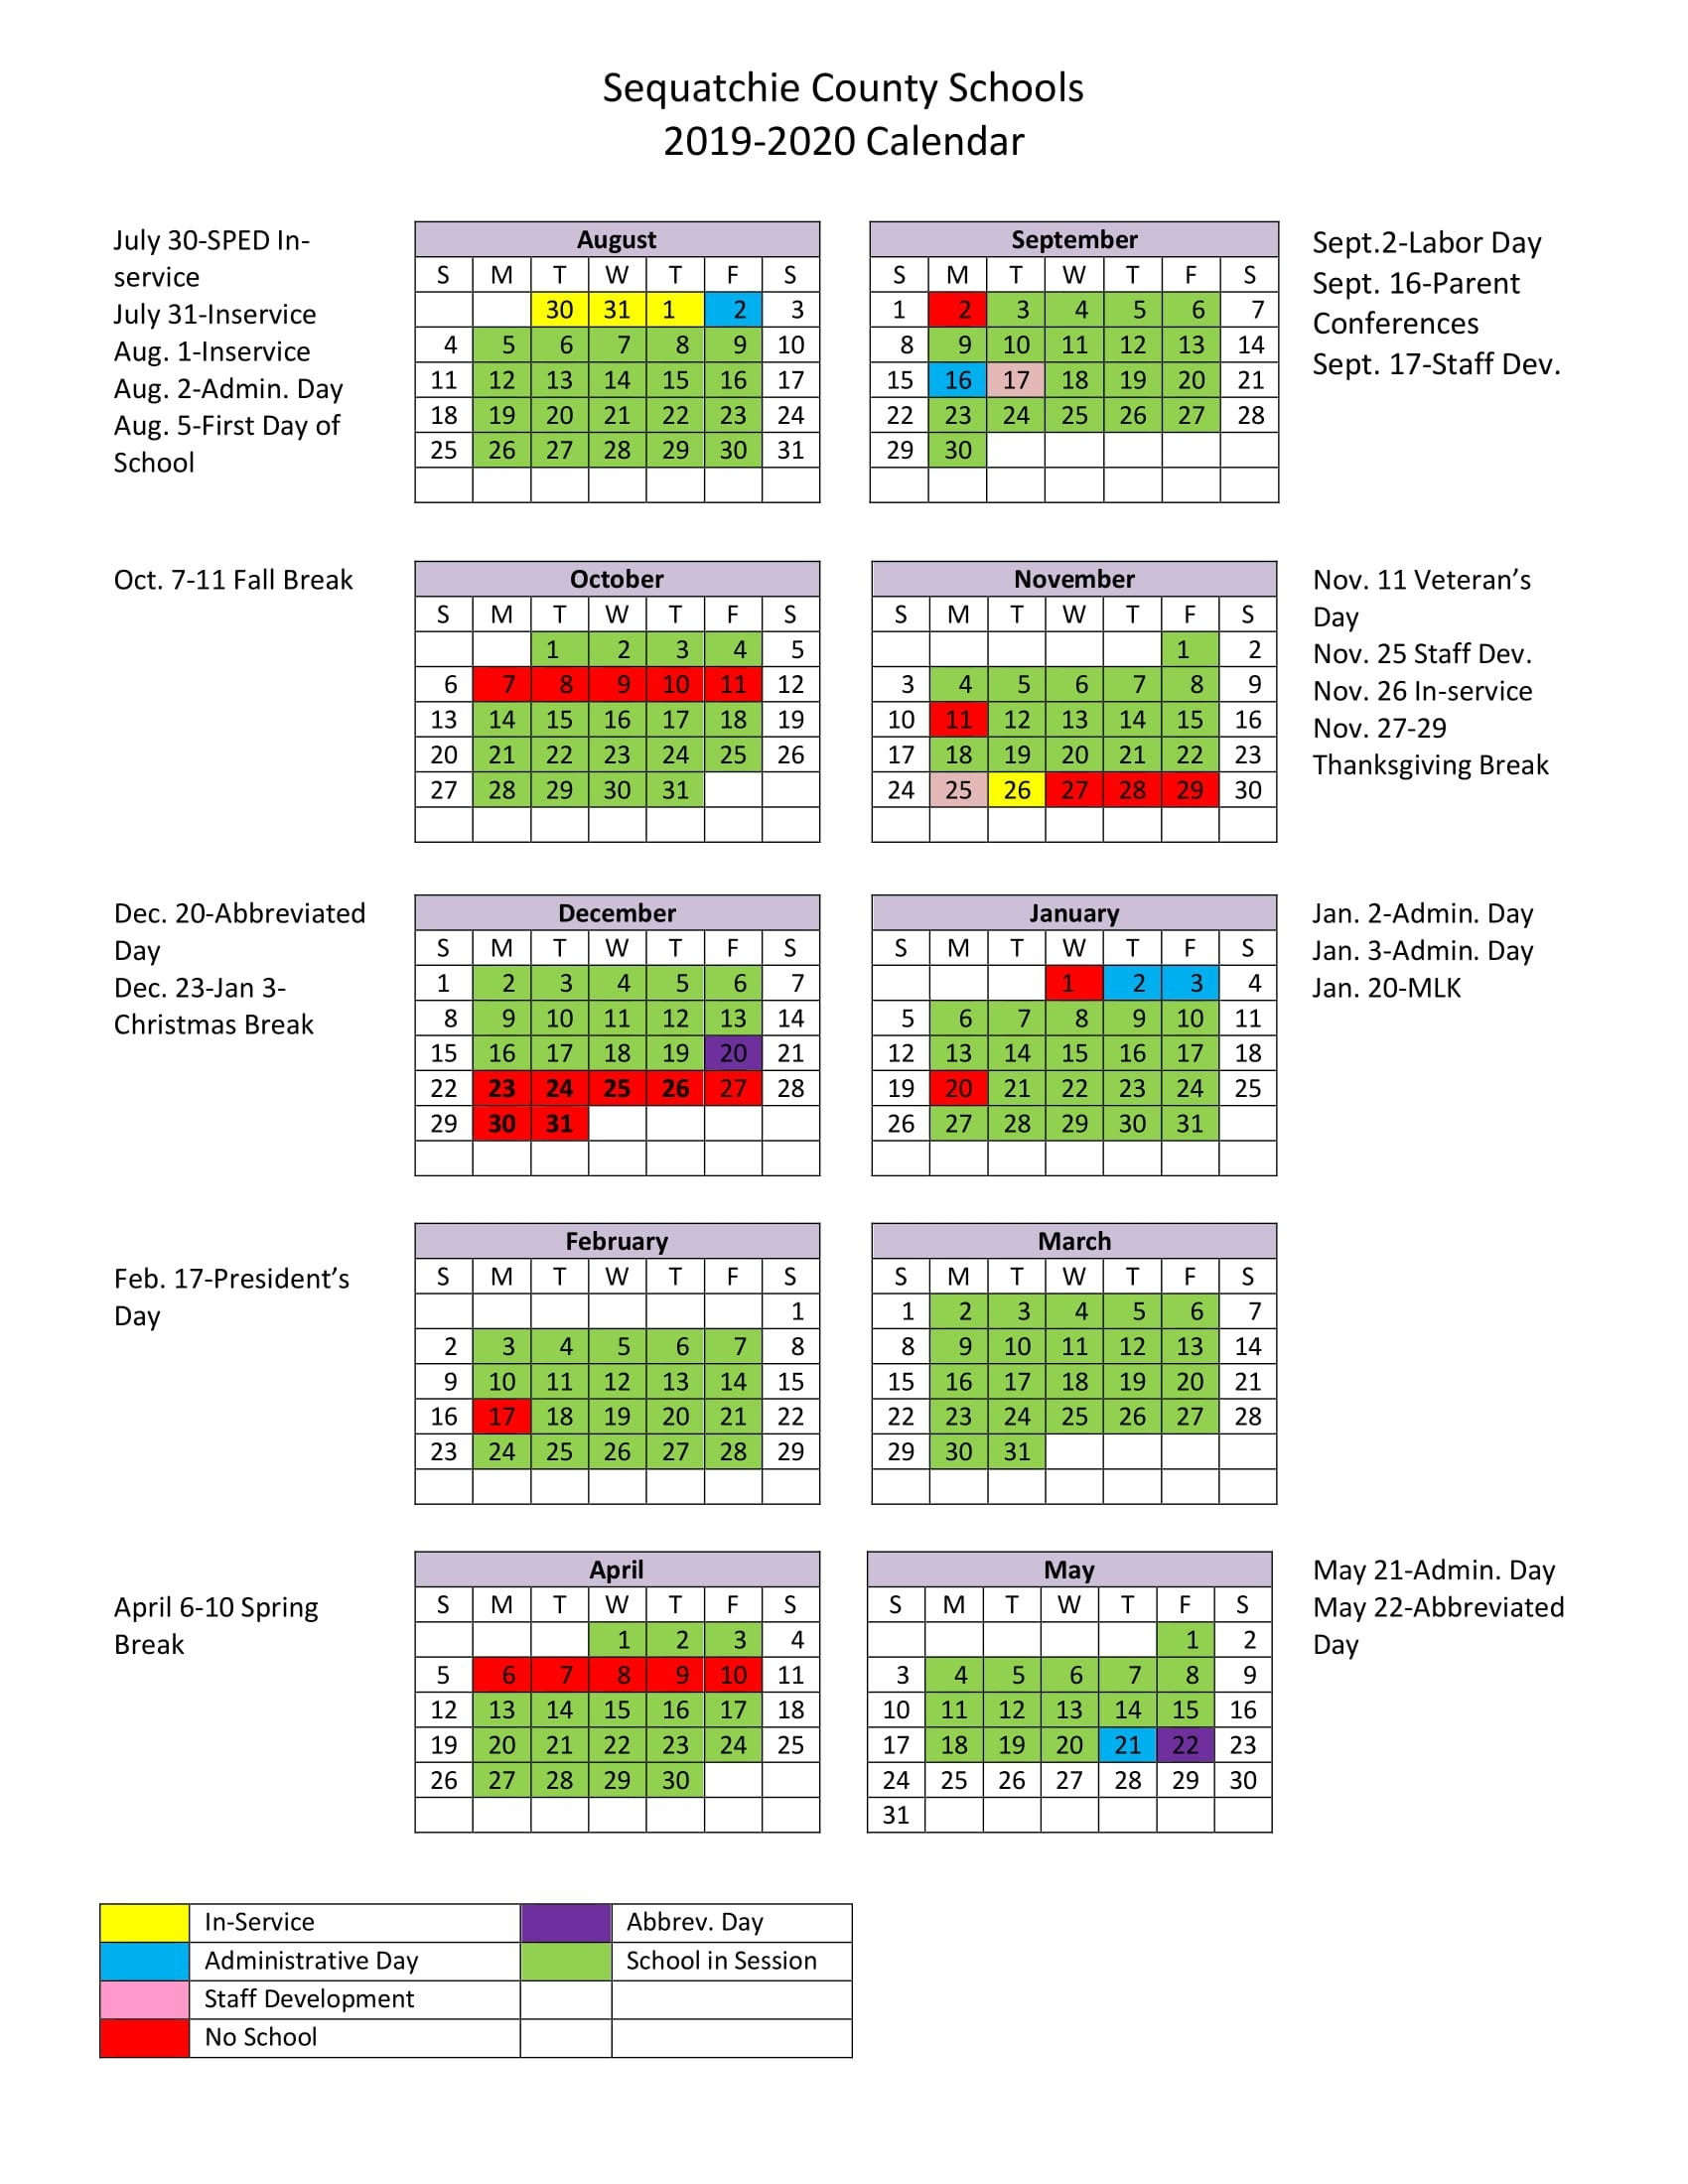 2018 19 School Calendar Calendar 2019 School